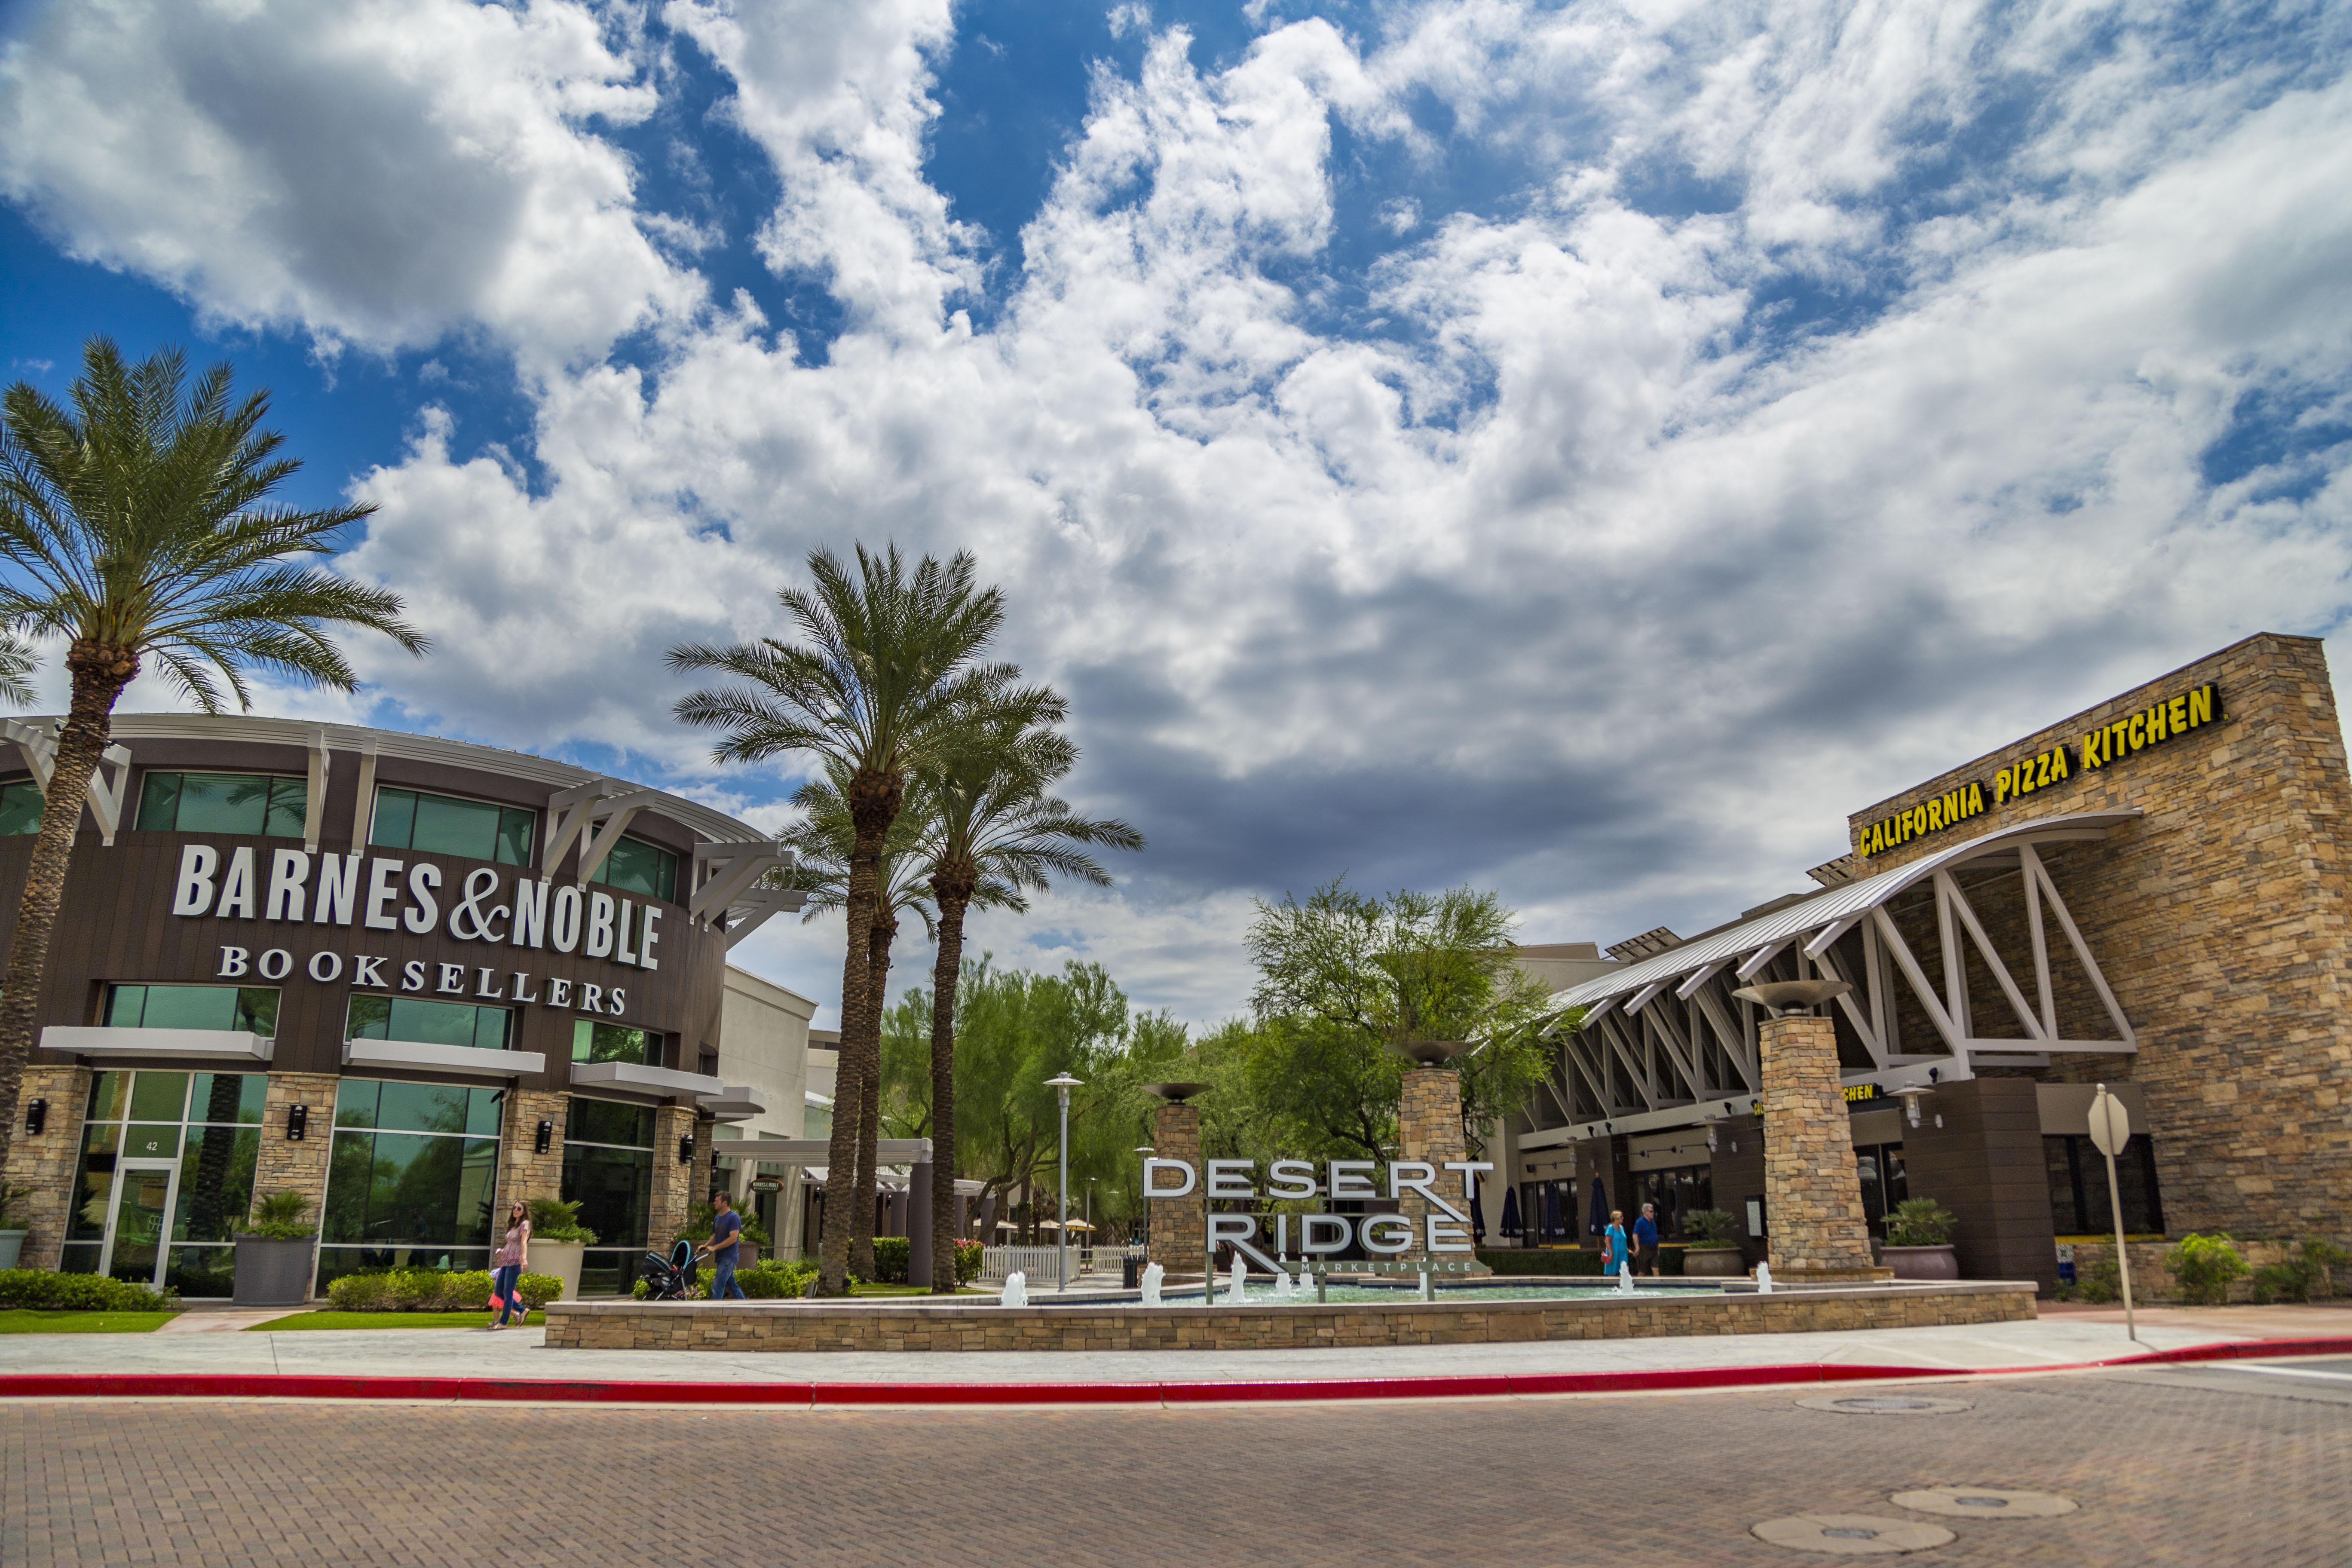 desert ridge mall map Desert Ridge Marketplace Phoenix Az 85050 desert ridge mall map